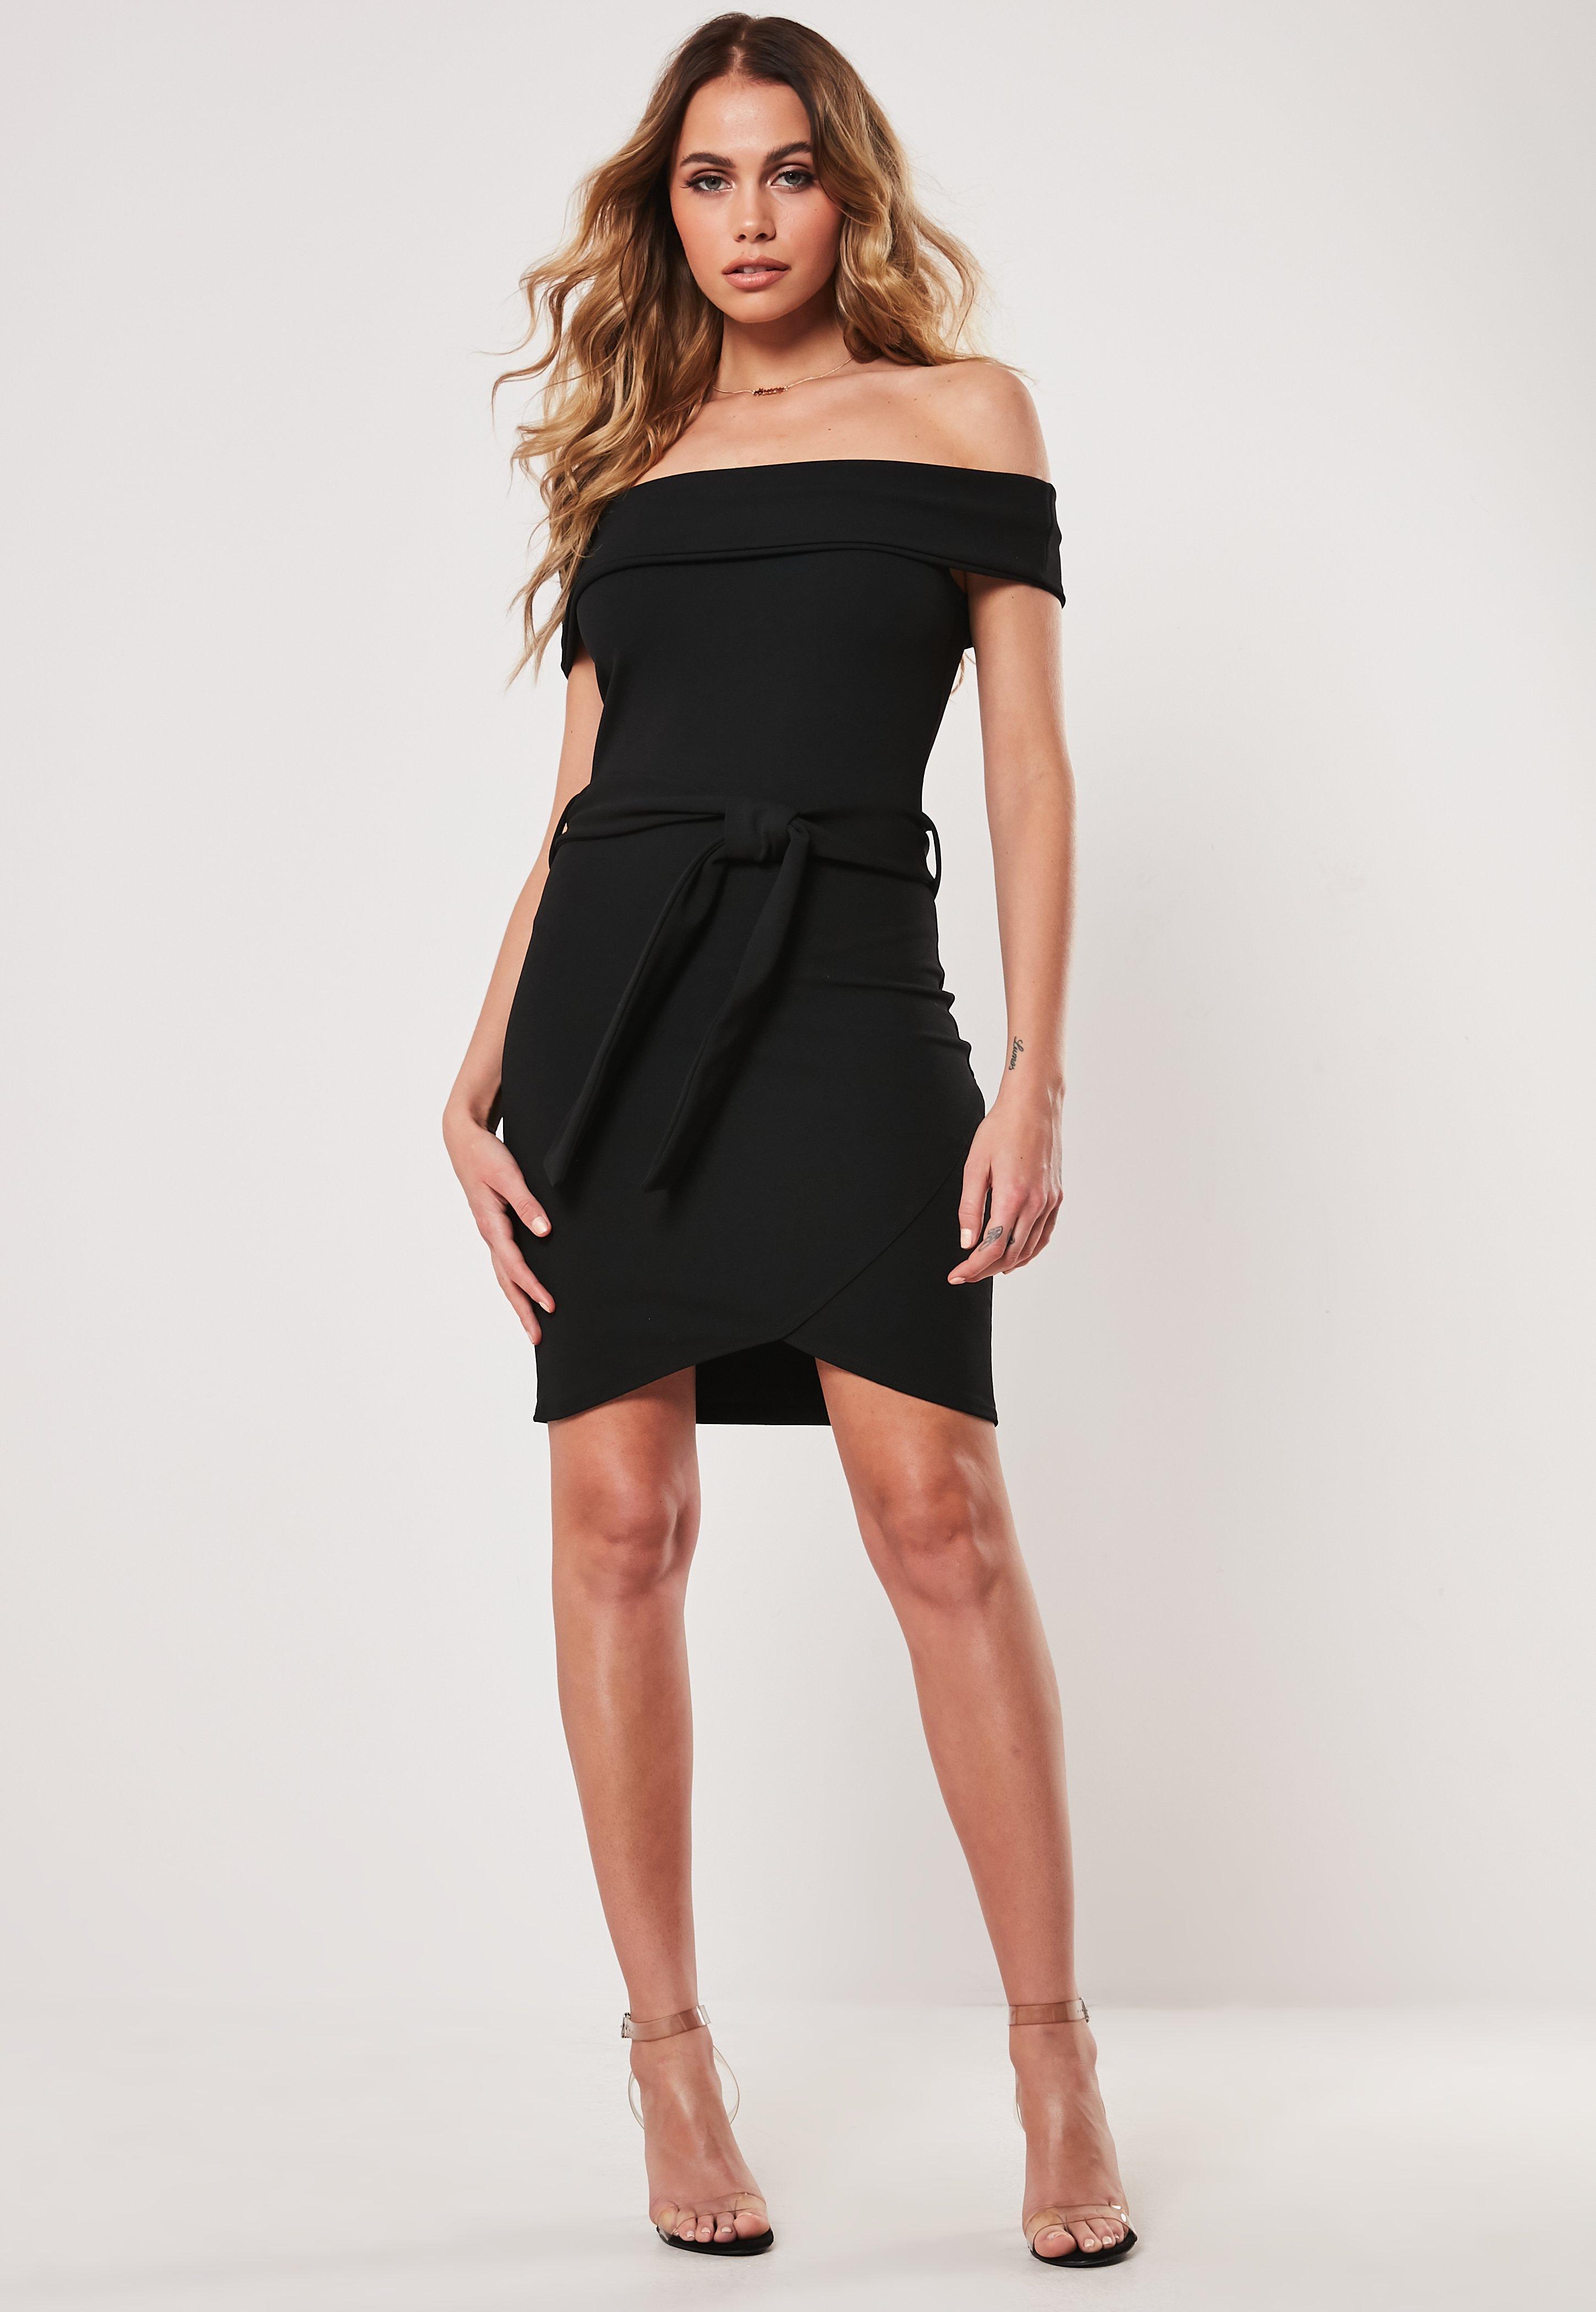 acbbce18af9d Bandeau Dresses   Shop Strapless Dresses - Missguided